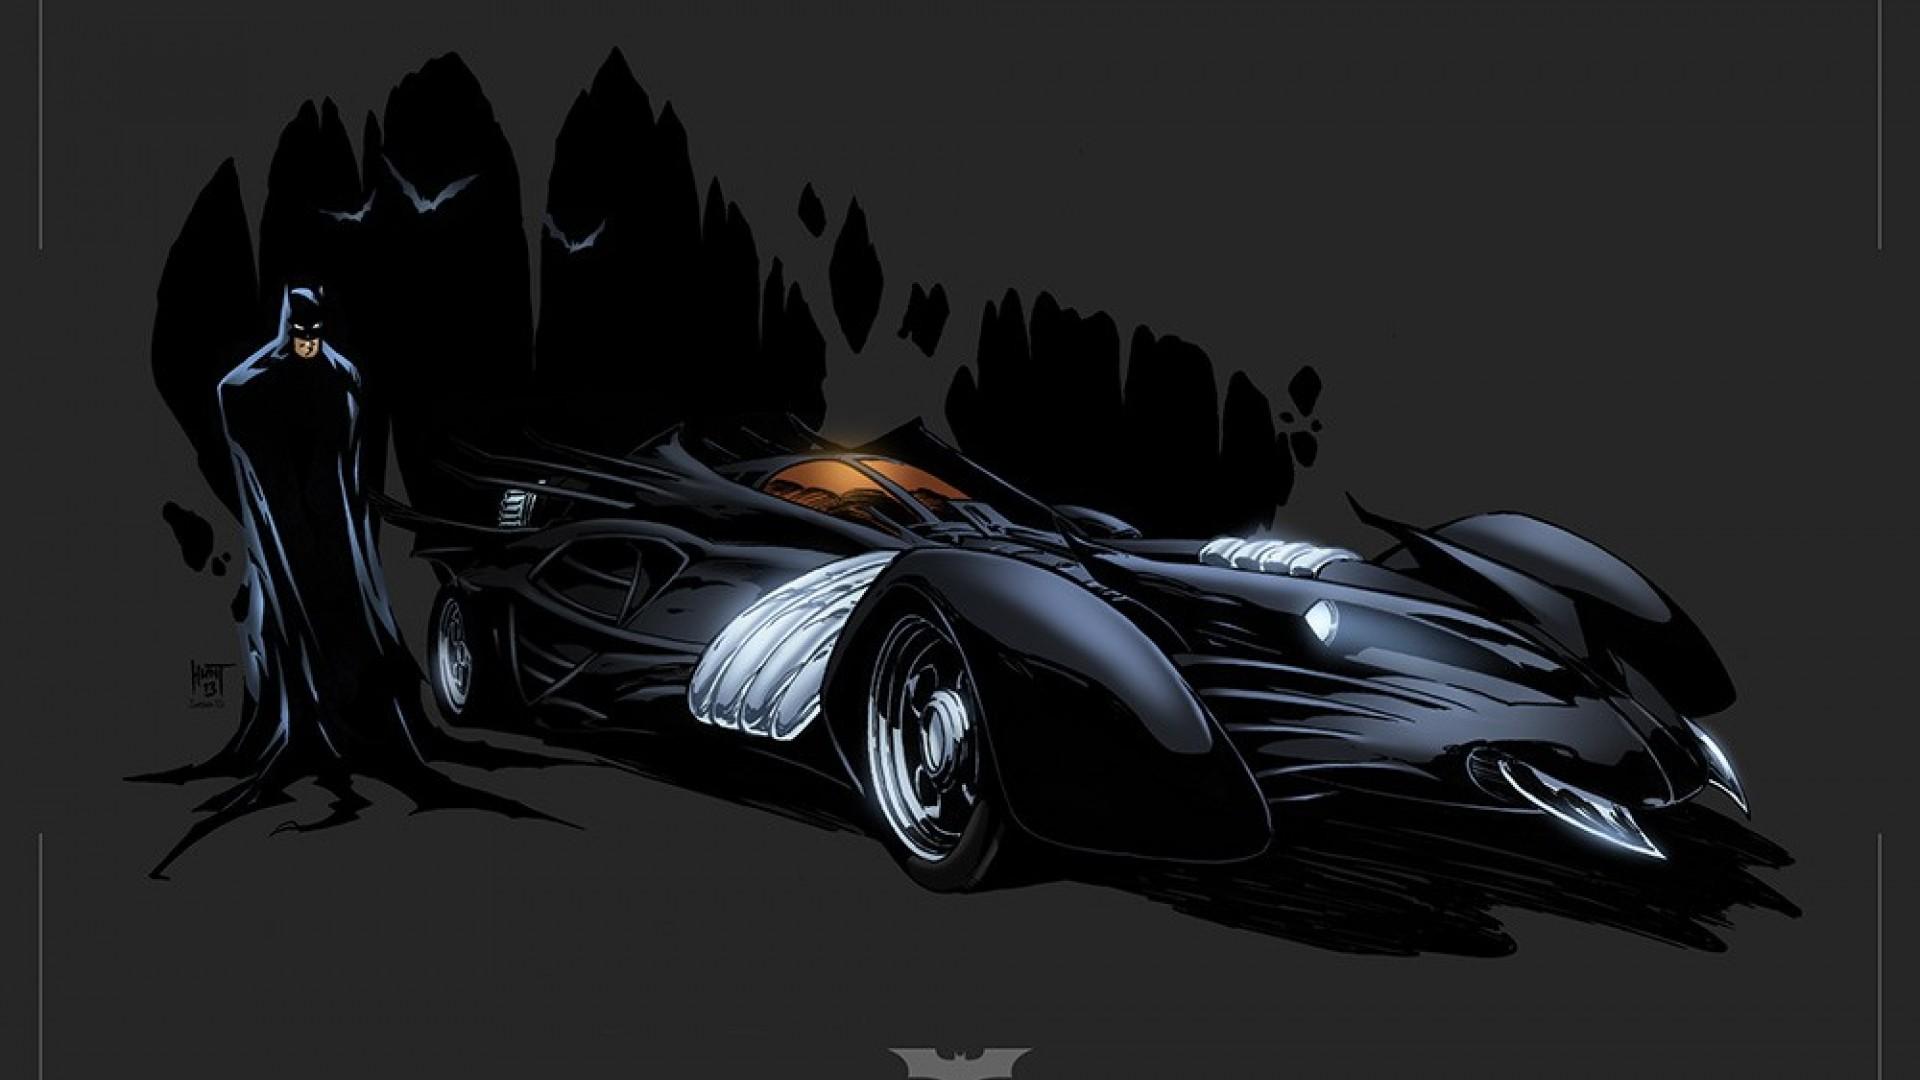 Fonds dcran Batmobile tous les wallpapers Batmobile 1920x1080